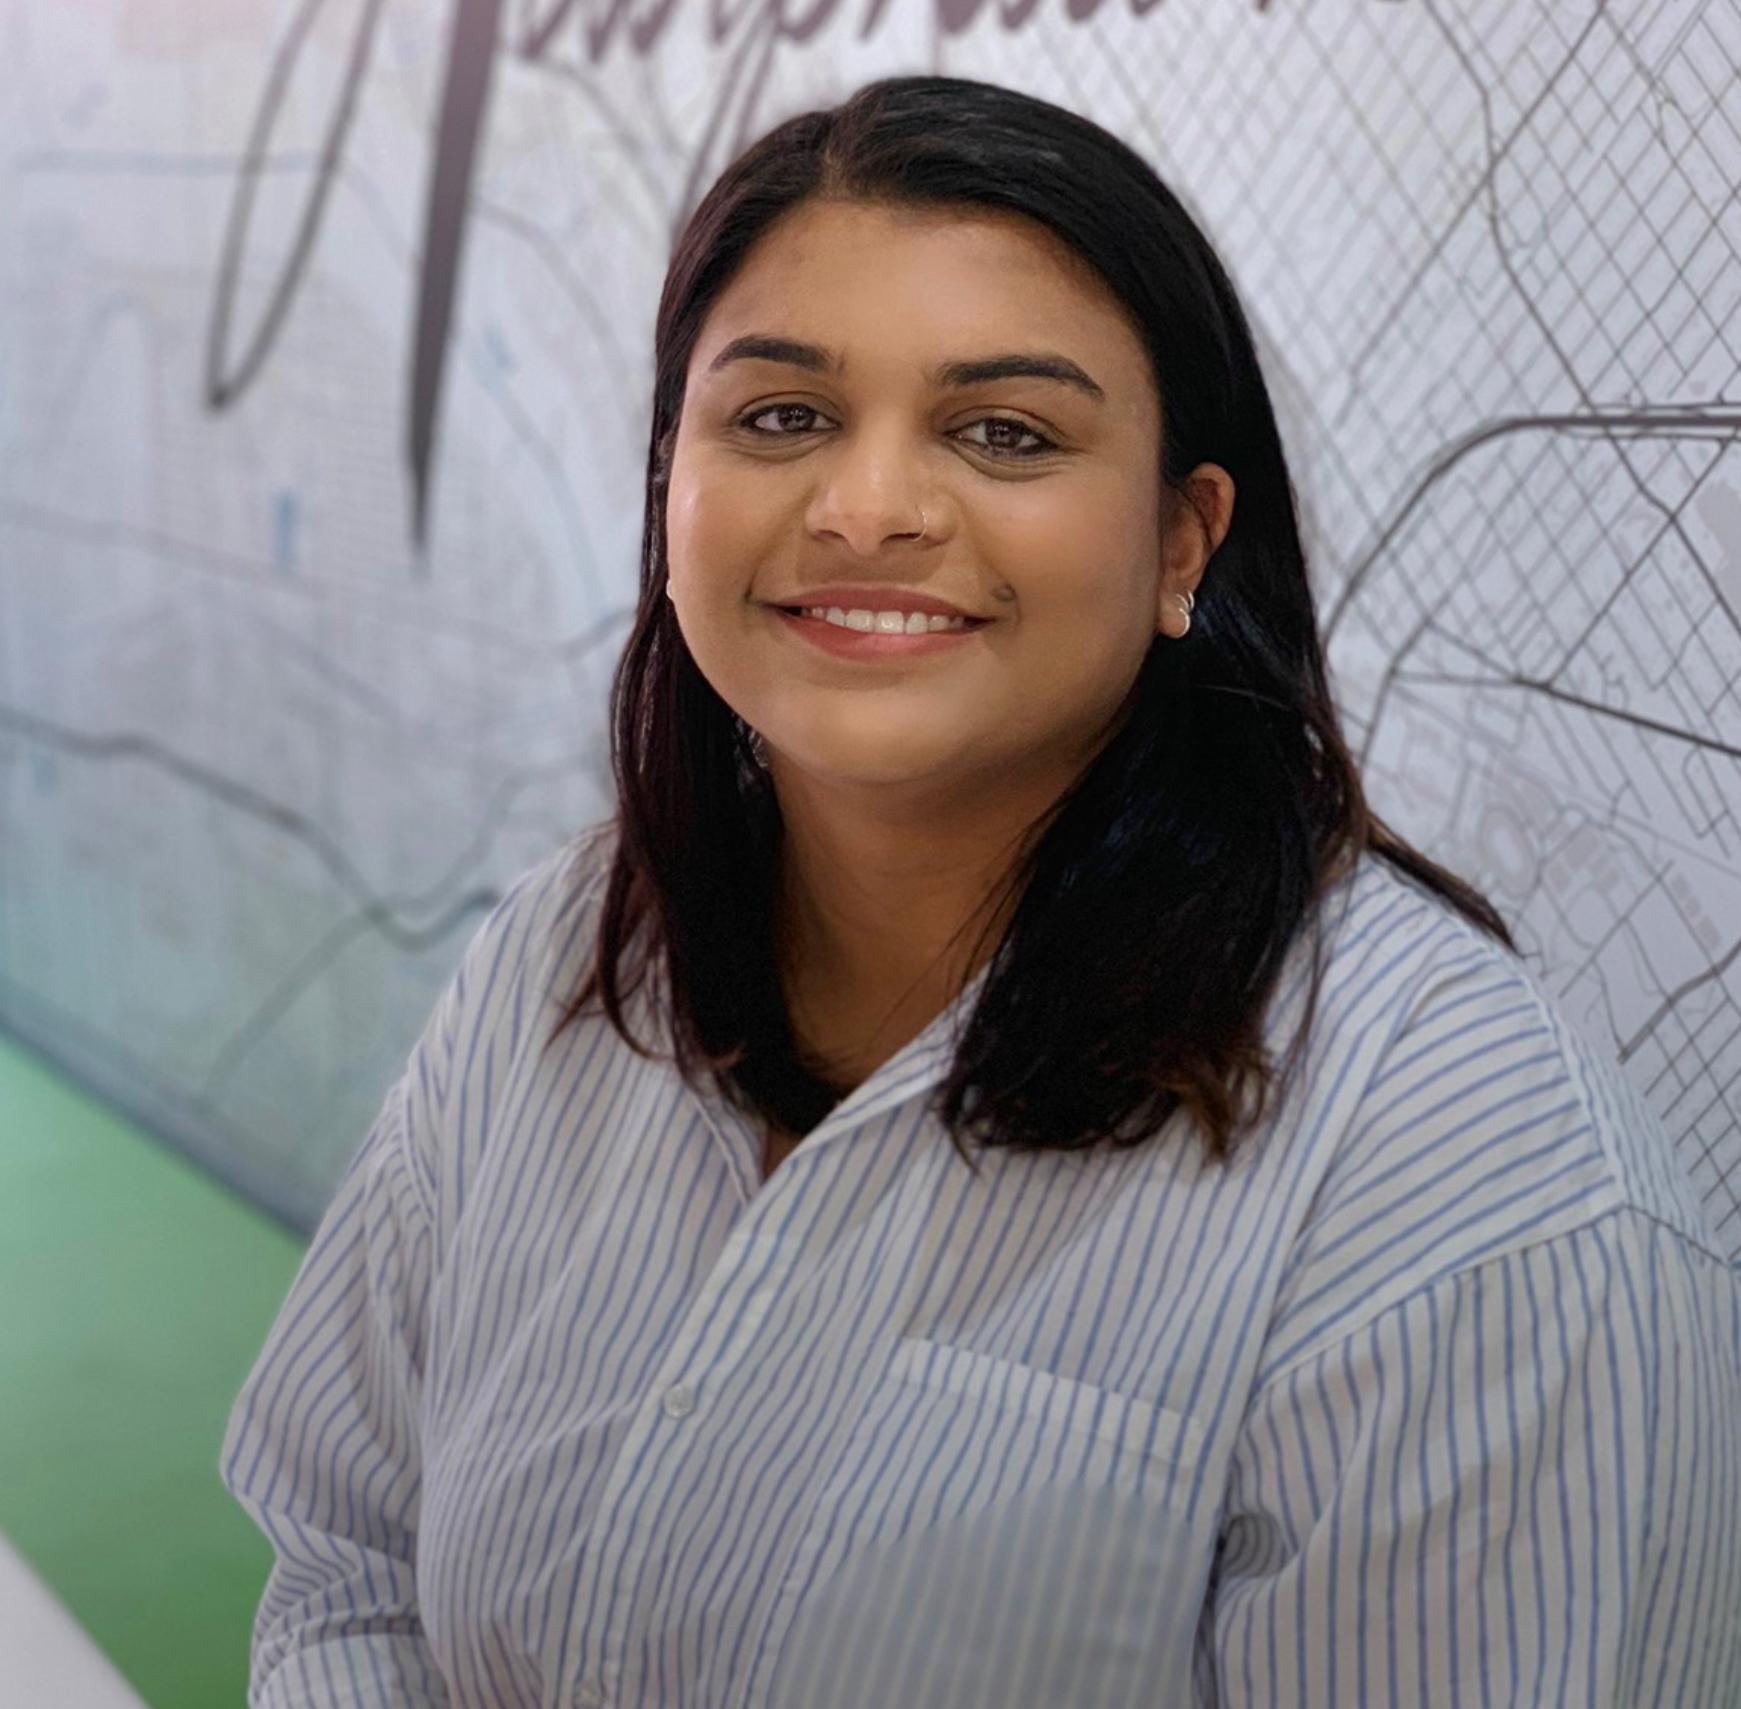 Ashni Pabley, PR Professional & Growth Strategist